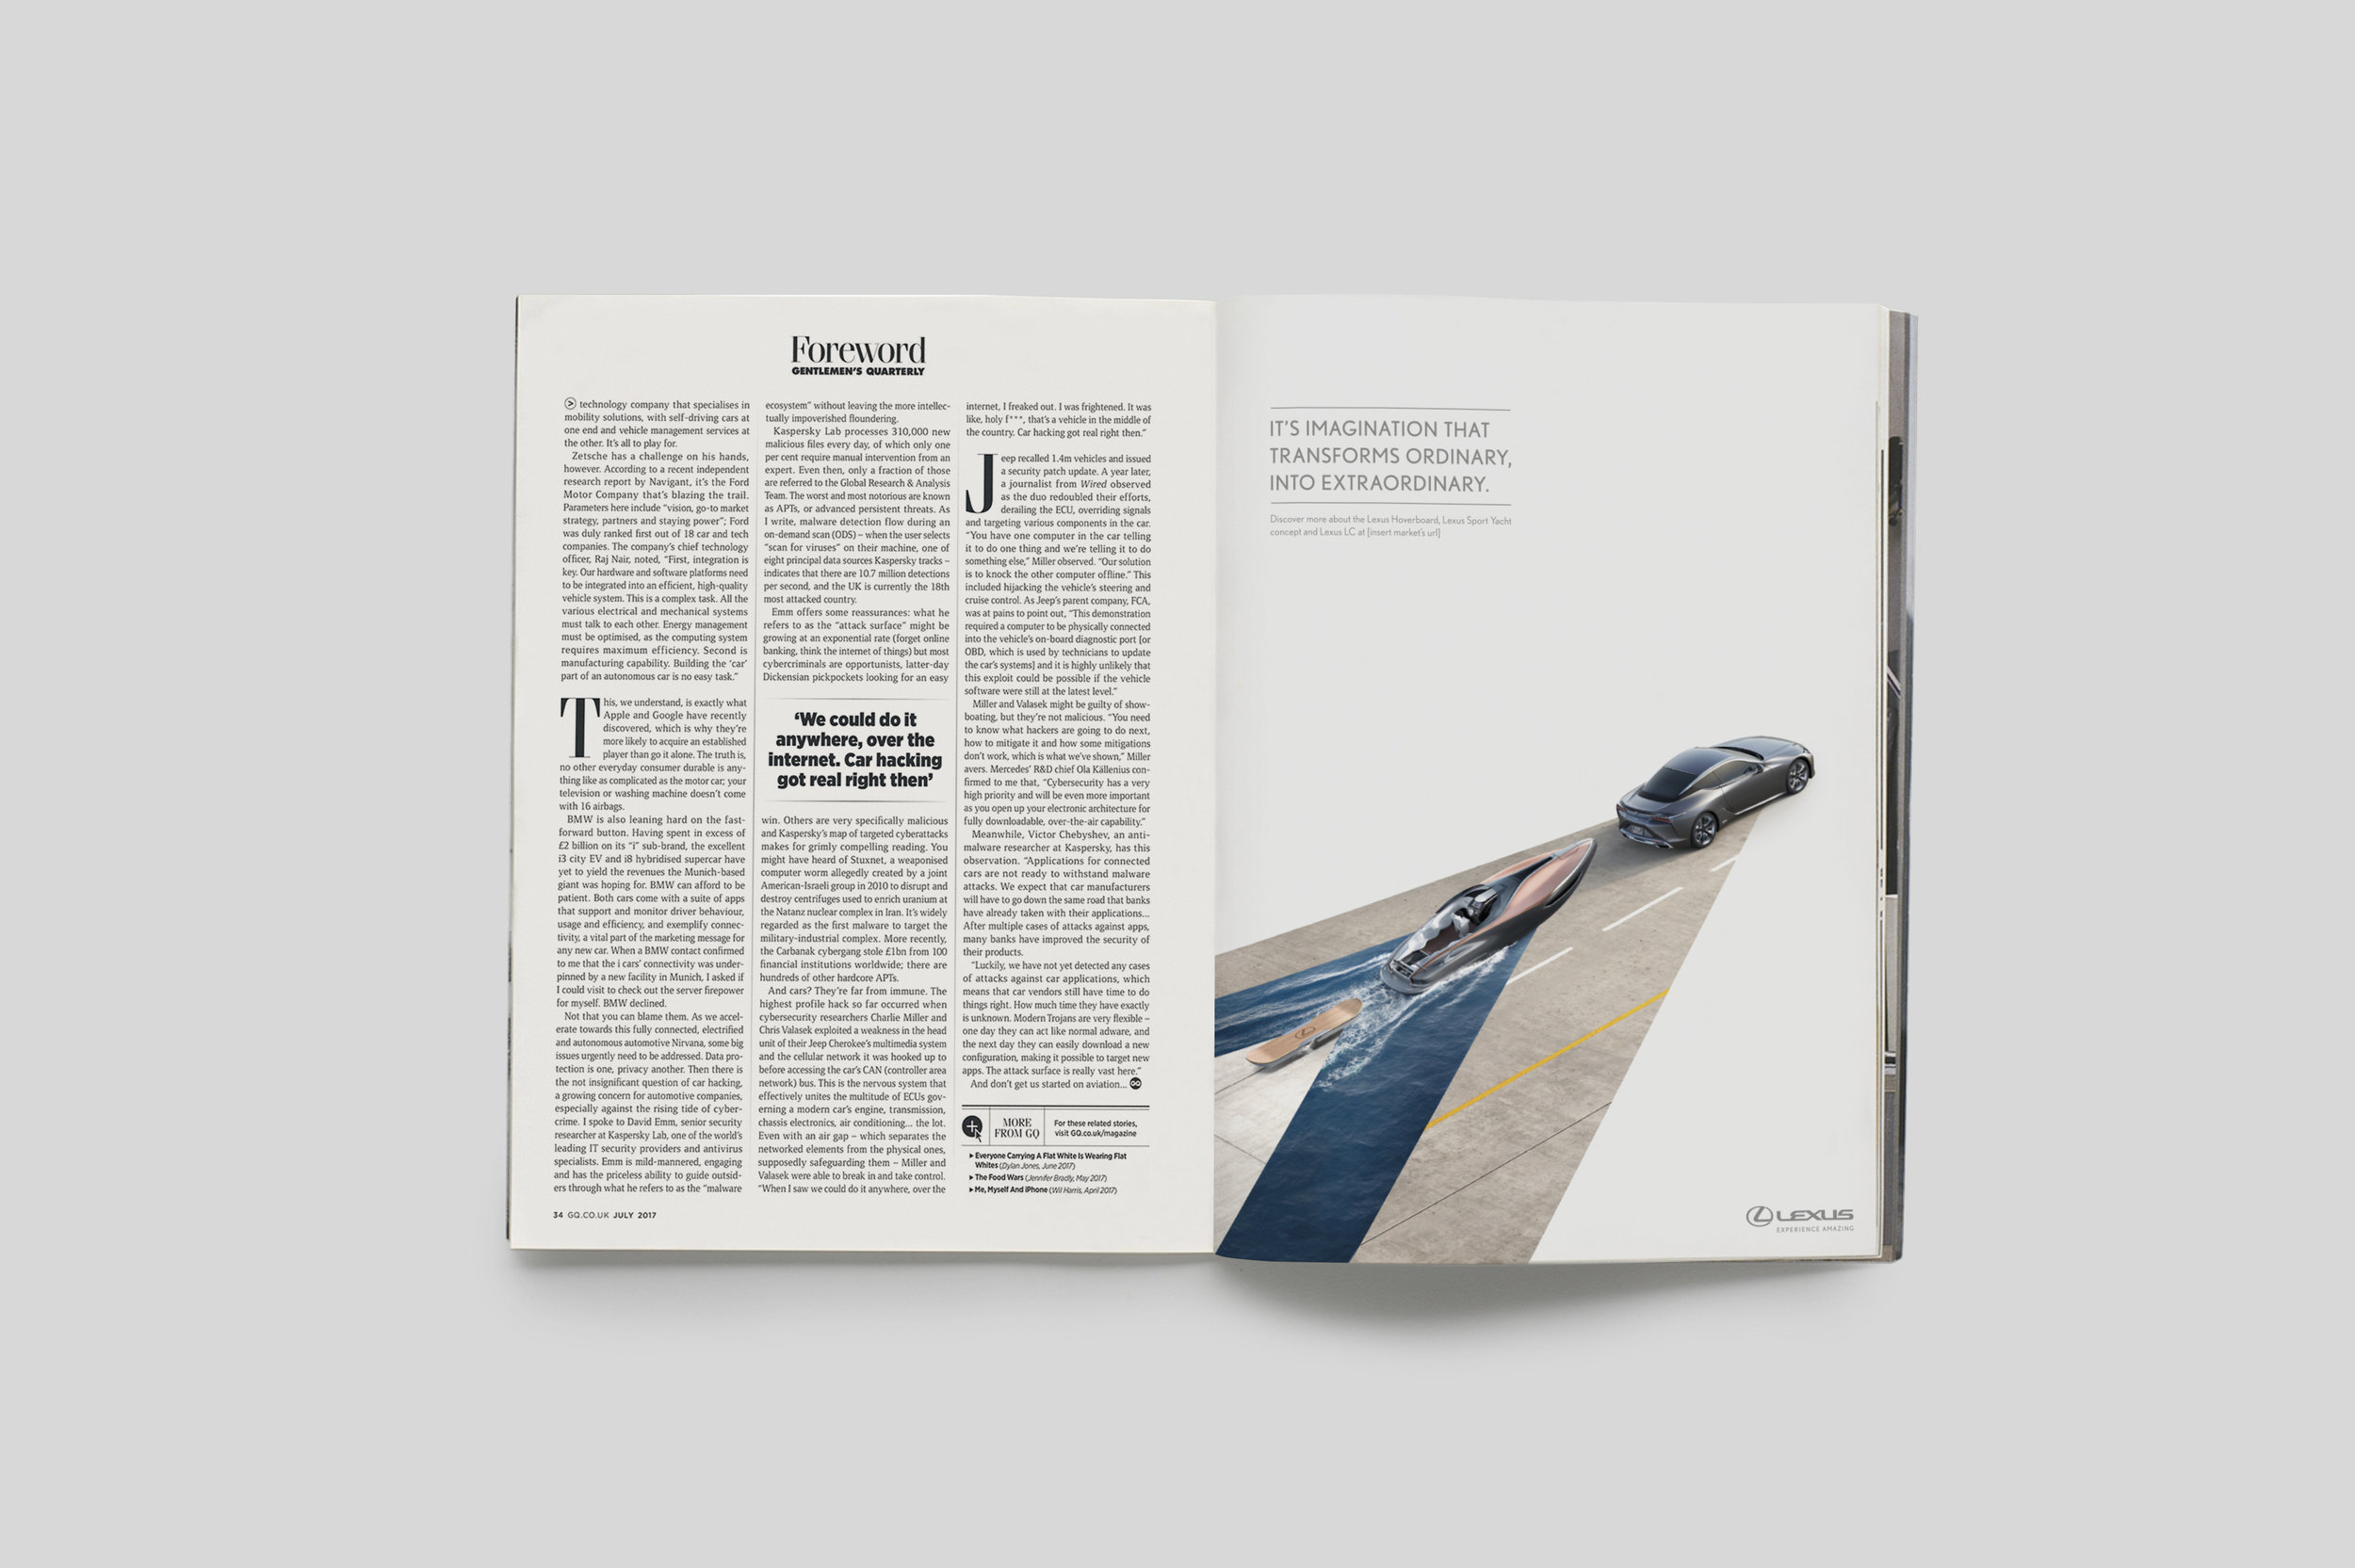 Lexus_Shift_Magazine_Insitu_01.jpg